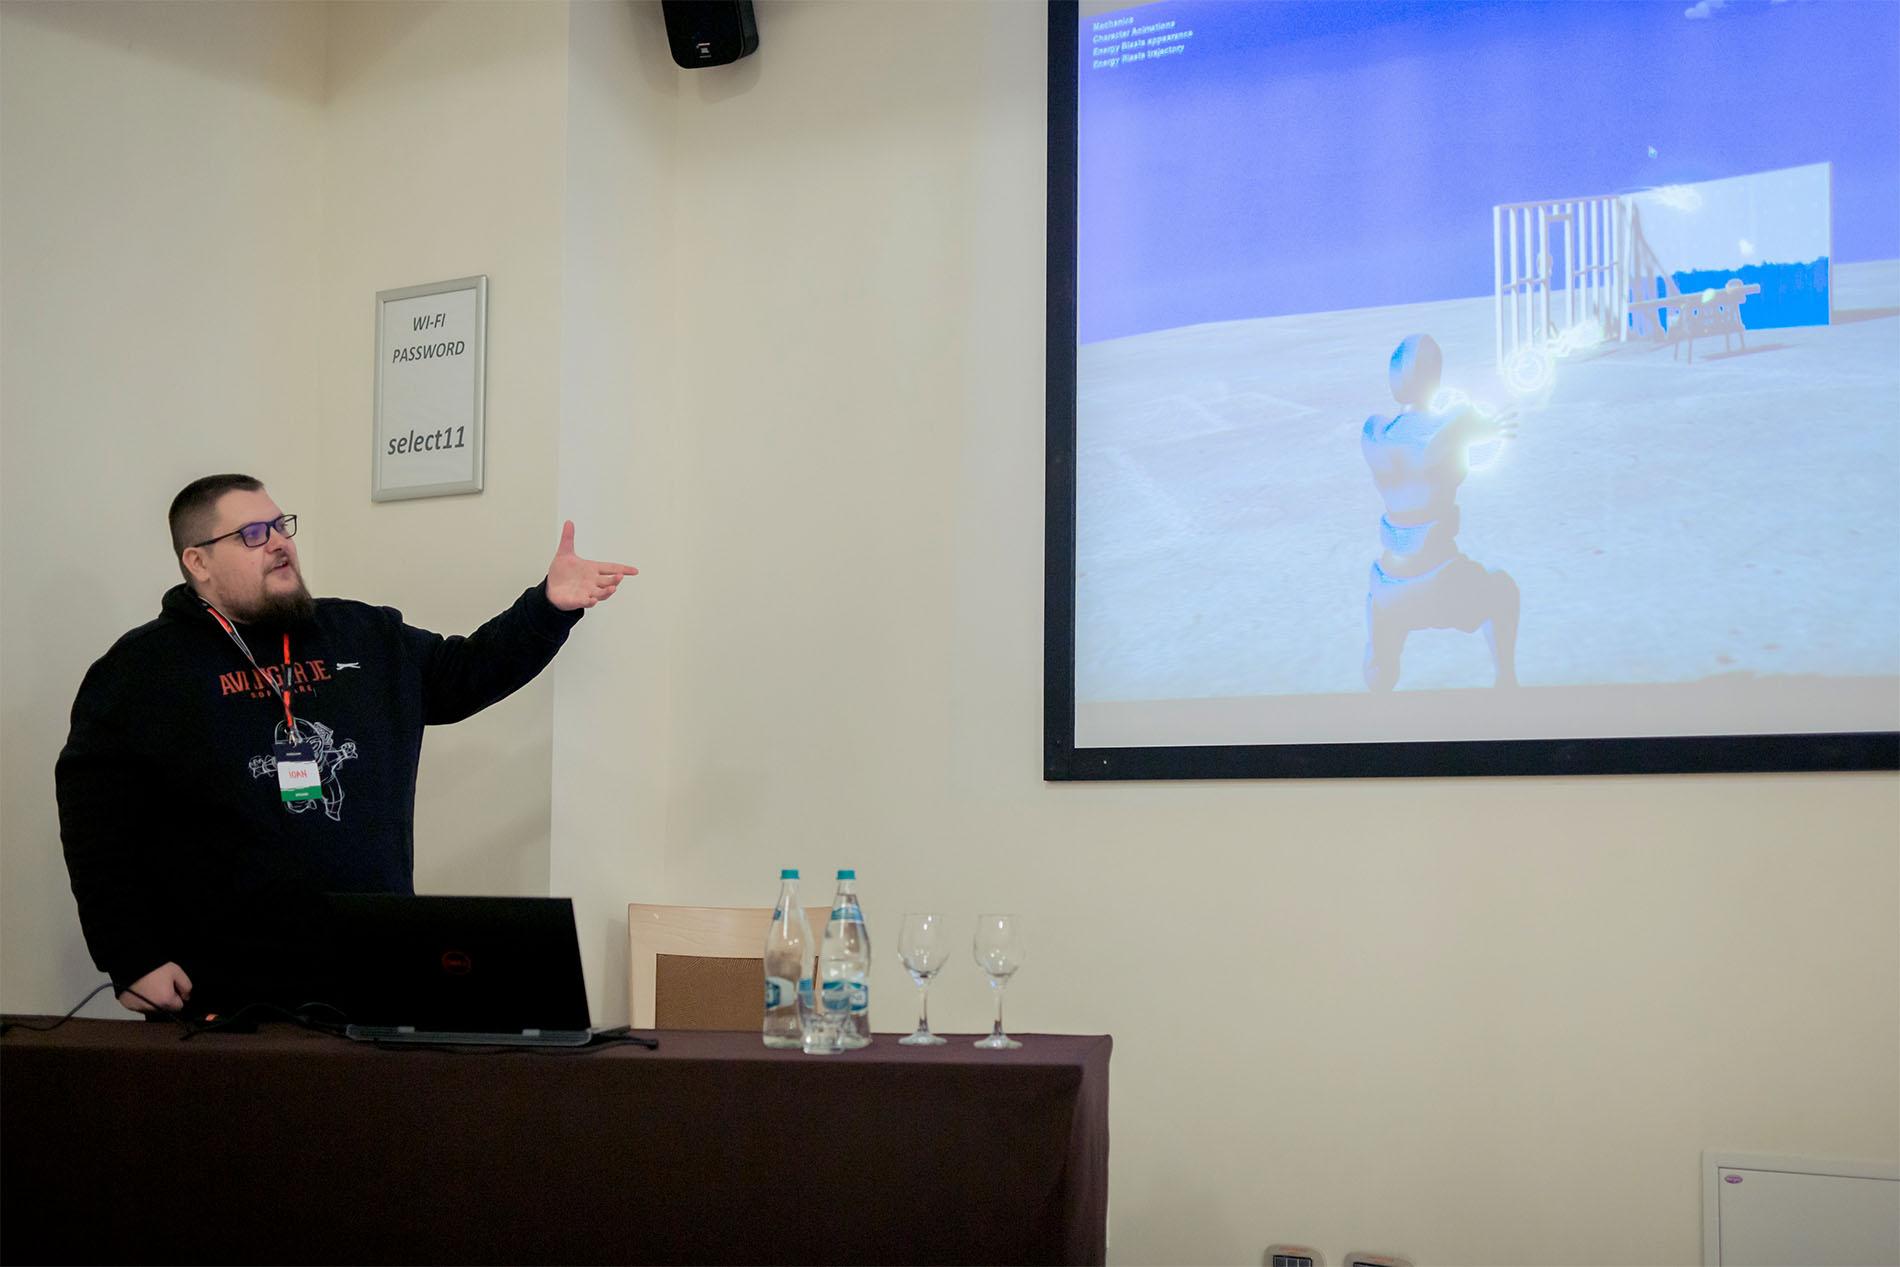 CodeCamp Presentation